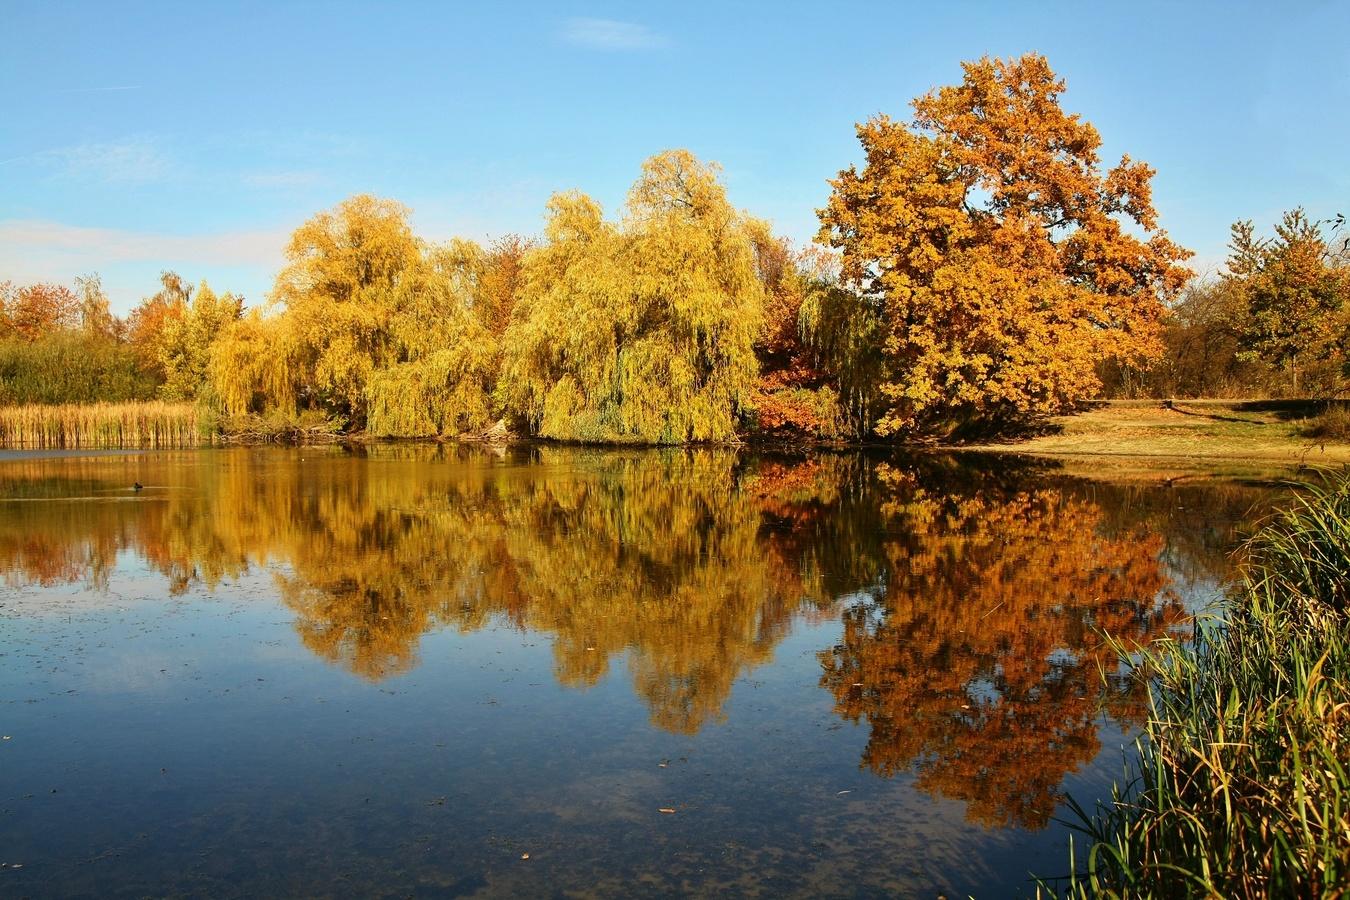 U rybníka 3